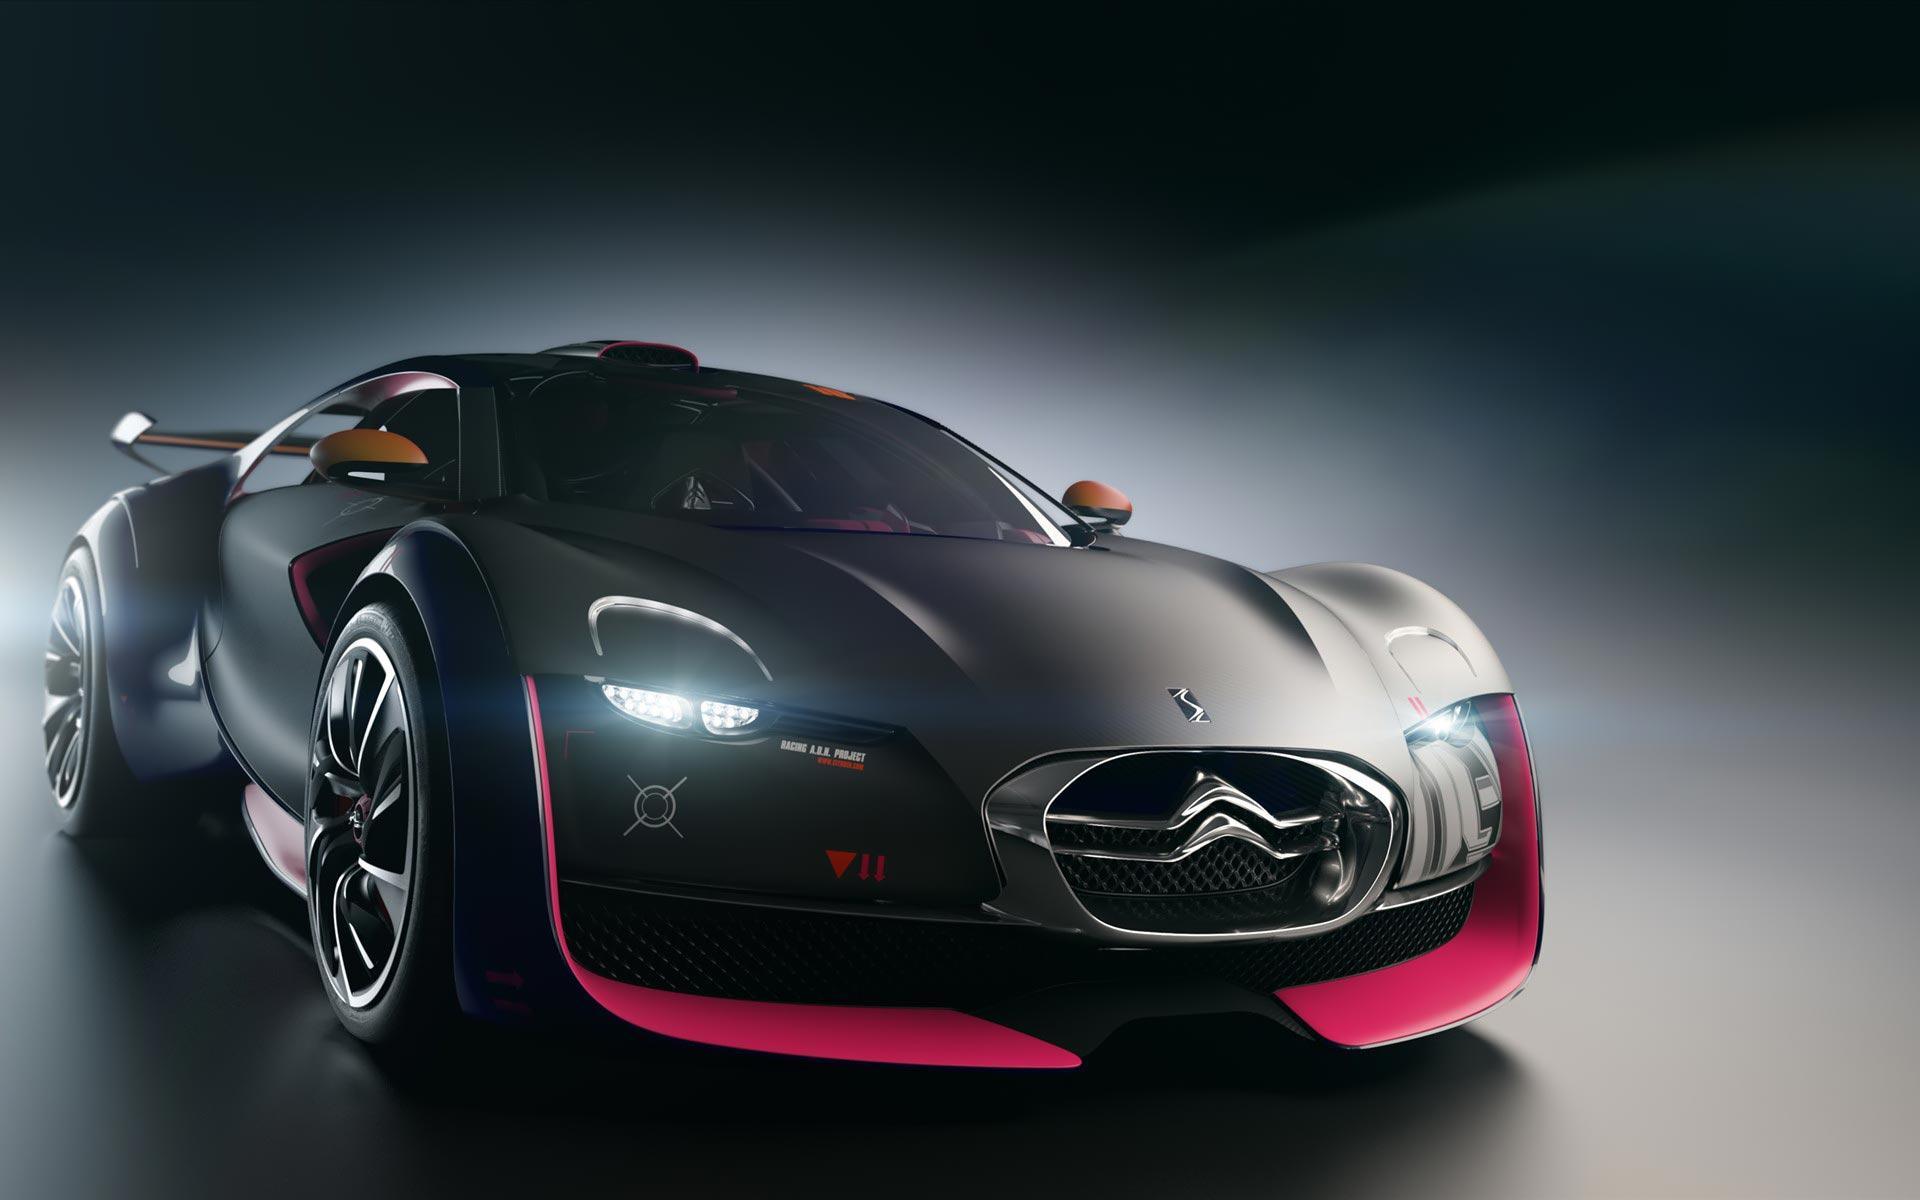 Sports Cars Hd Wallpapers Top Free Sports Cars Hd